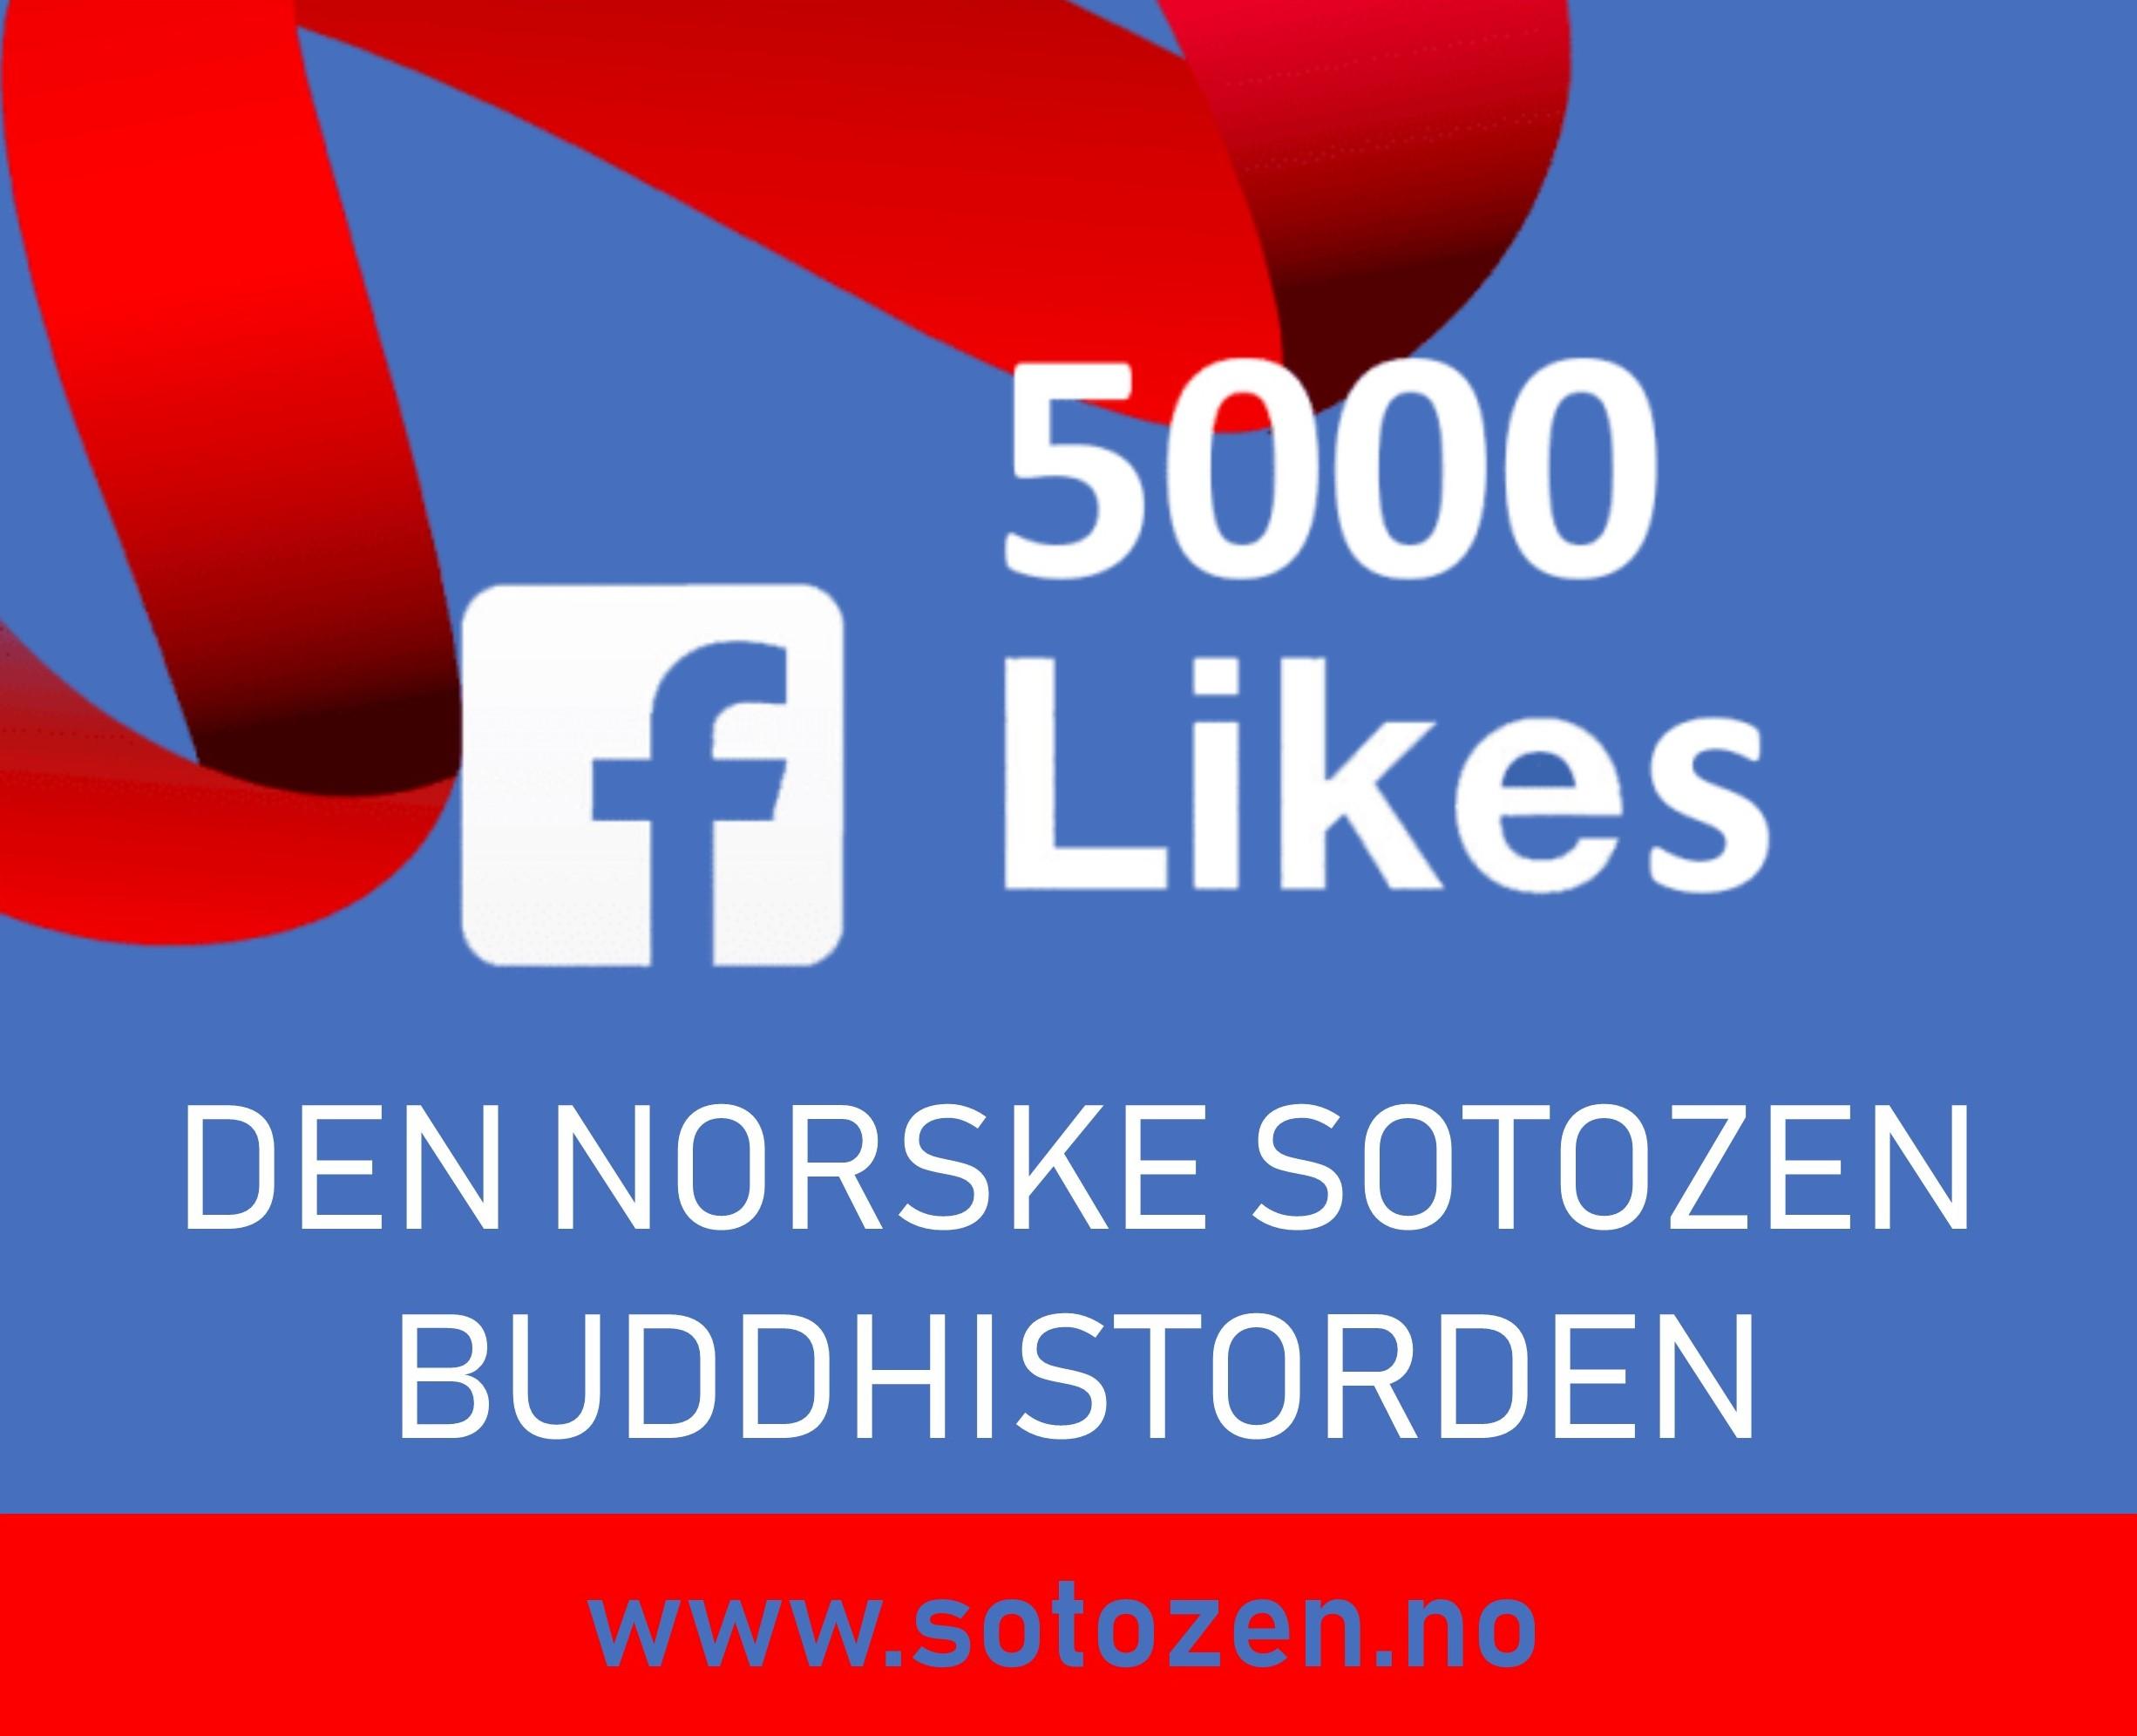 6000likespåfacebook.jpg